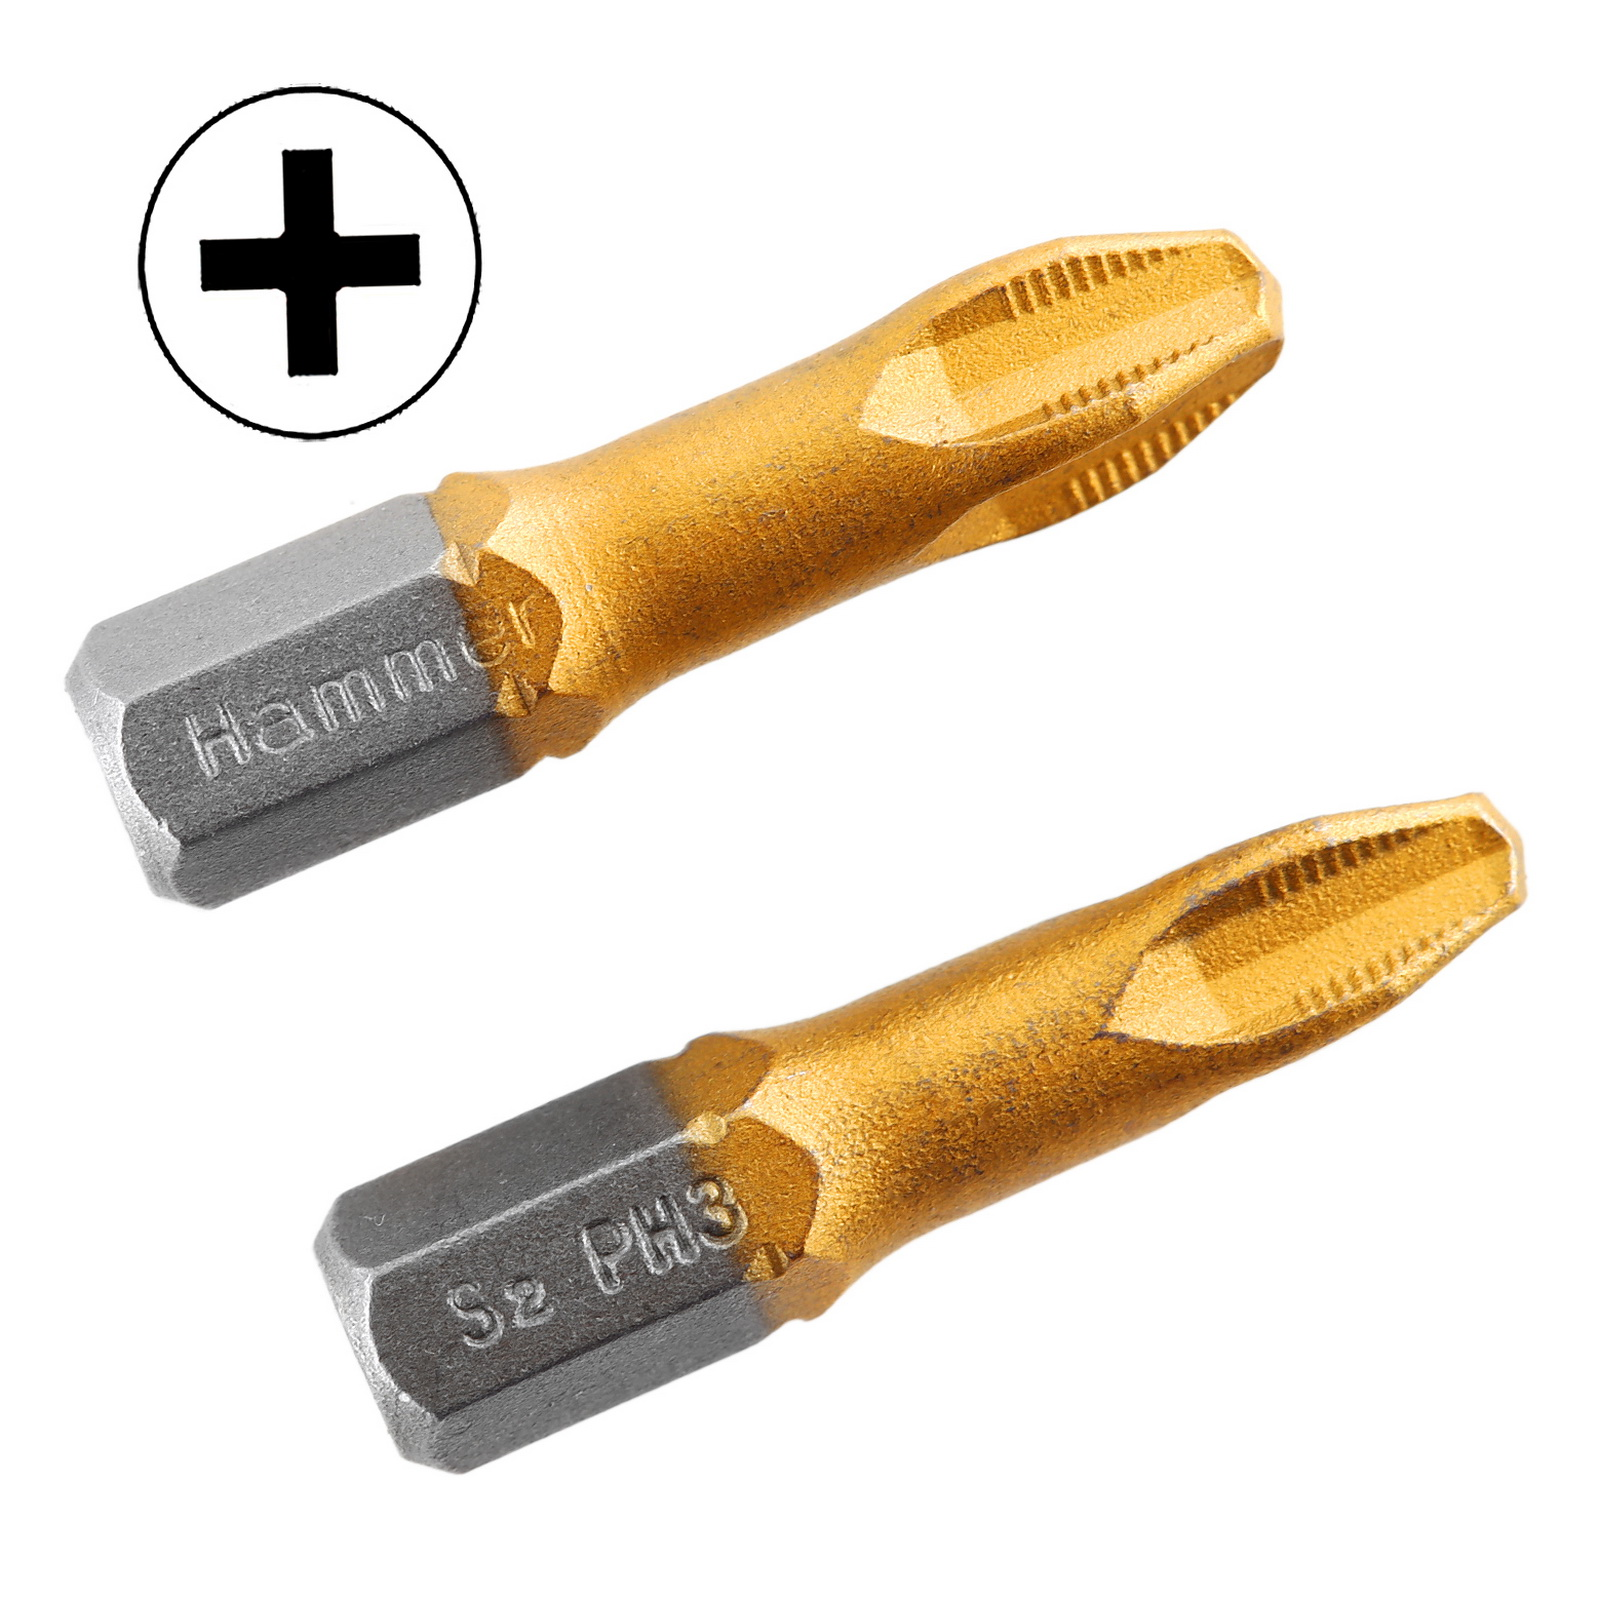 Бита Hammer Pb ph-3 25мм (2шт.) бита hammer pb pz 2 50мм 2шт